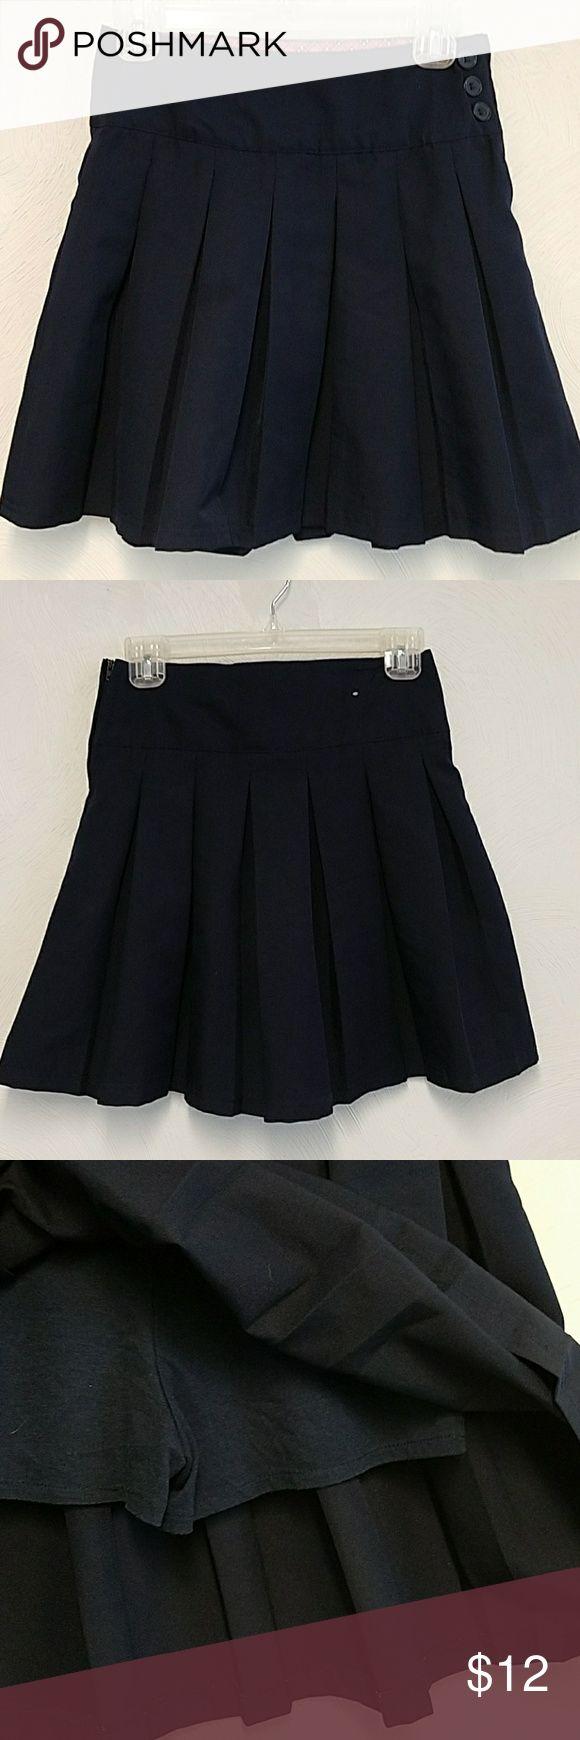 School Uniform Skort Skirt School Uniform Skort Skirt Genuine School Uniform  Bottoms Skorts